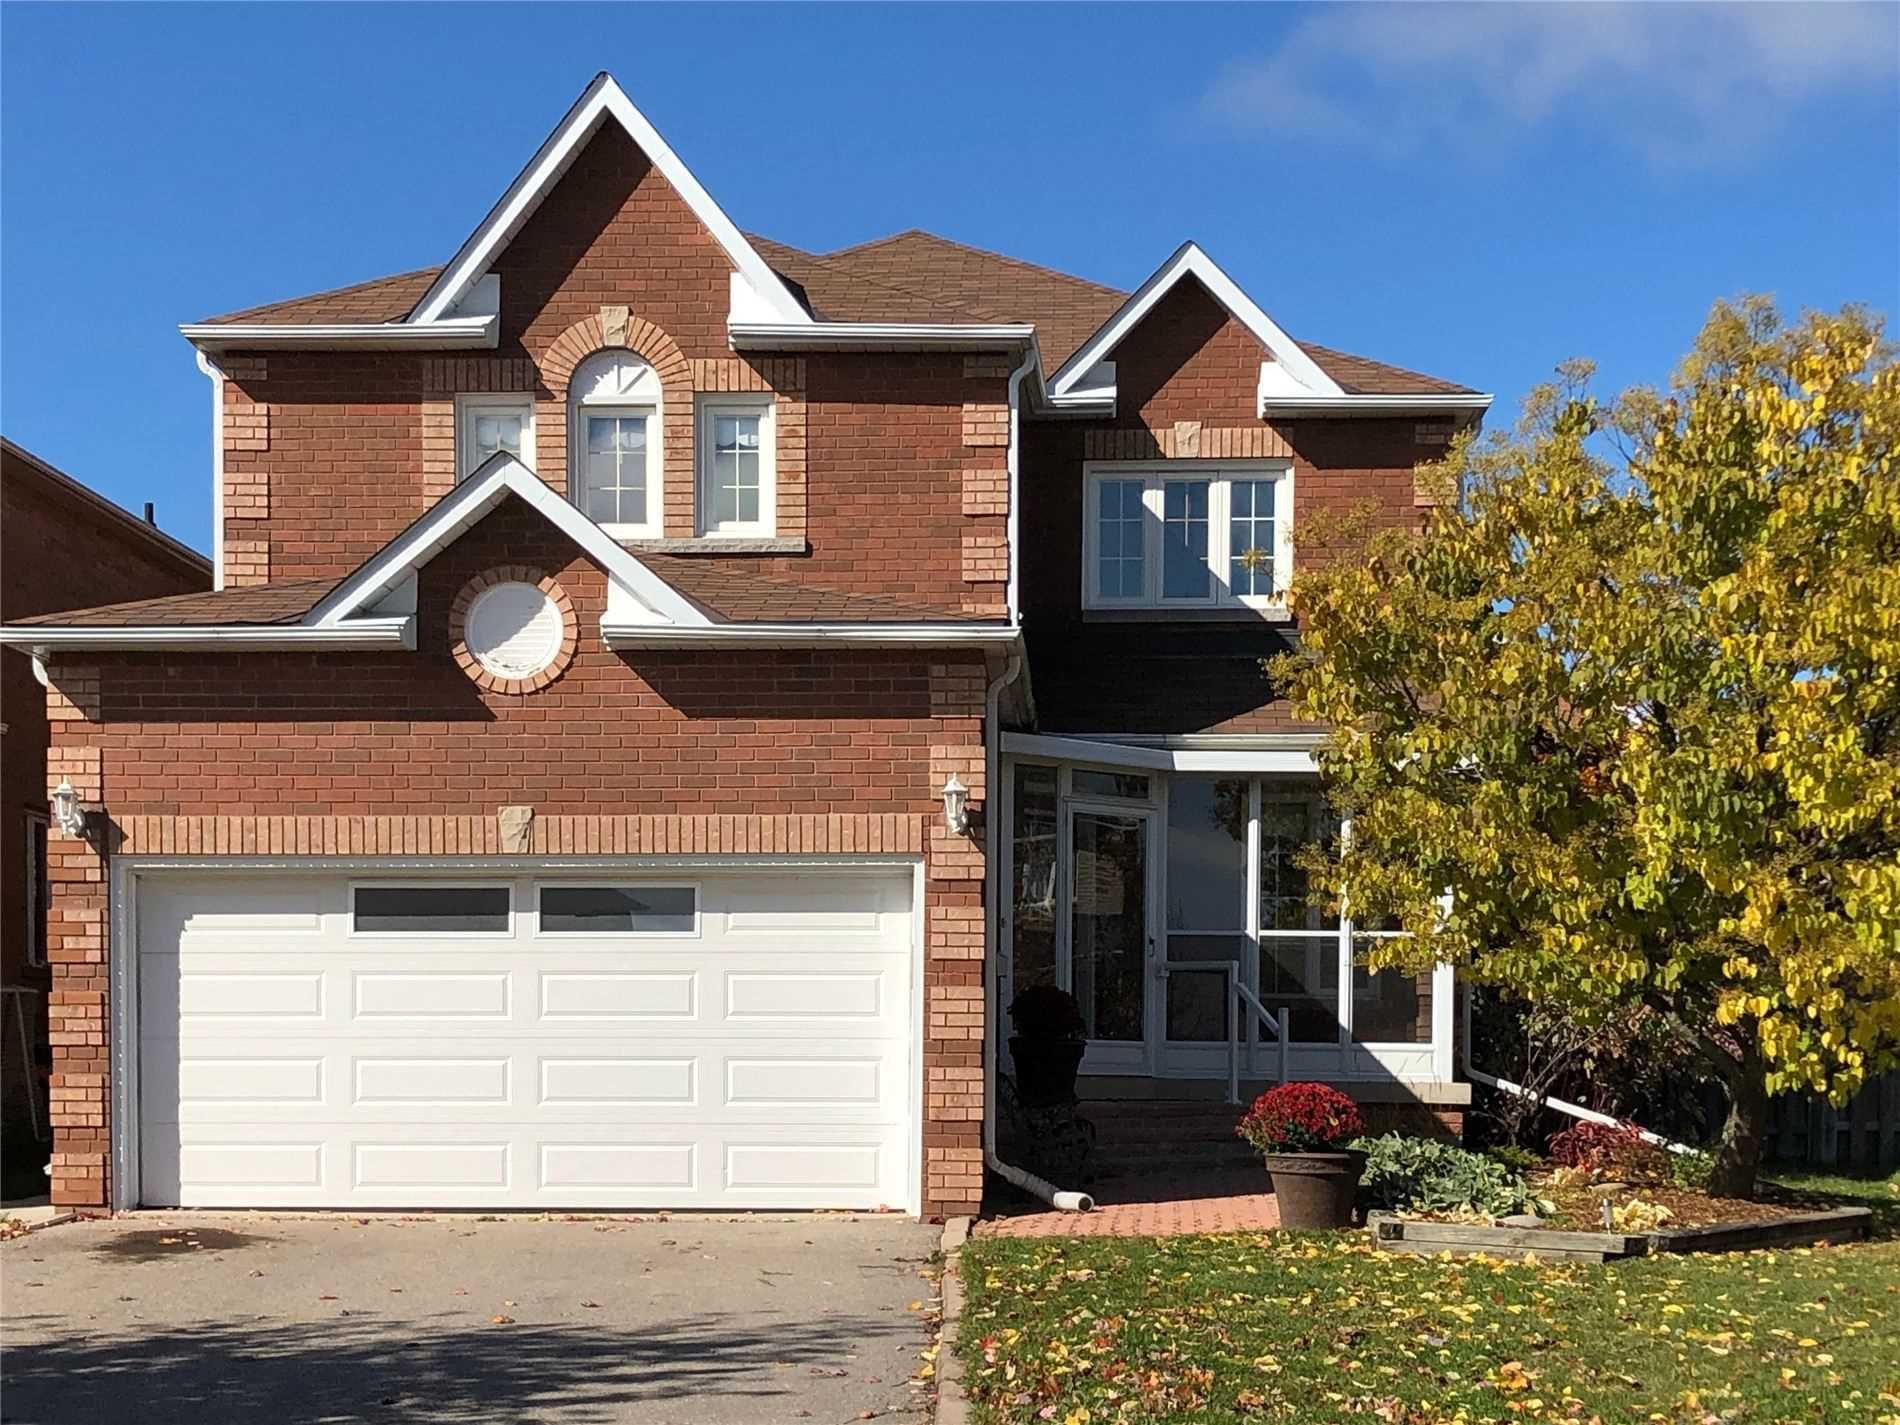 Main Photo: 131 Jordan Drive: Orangeville House (2-Storey) for sale : MLS®# W4611384